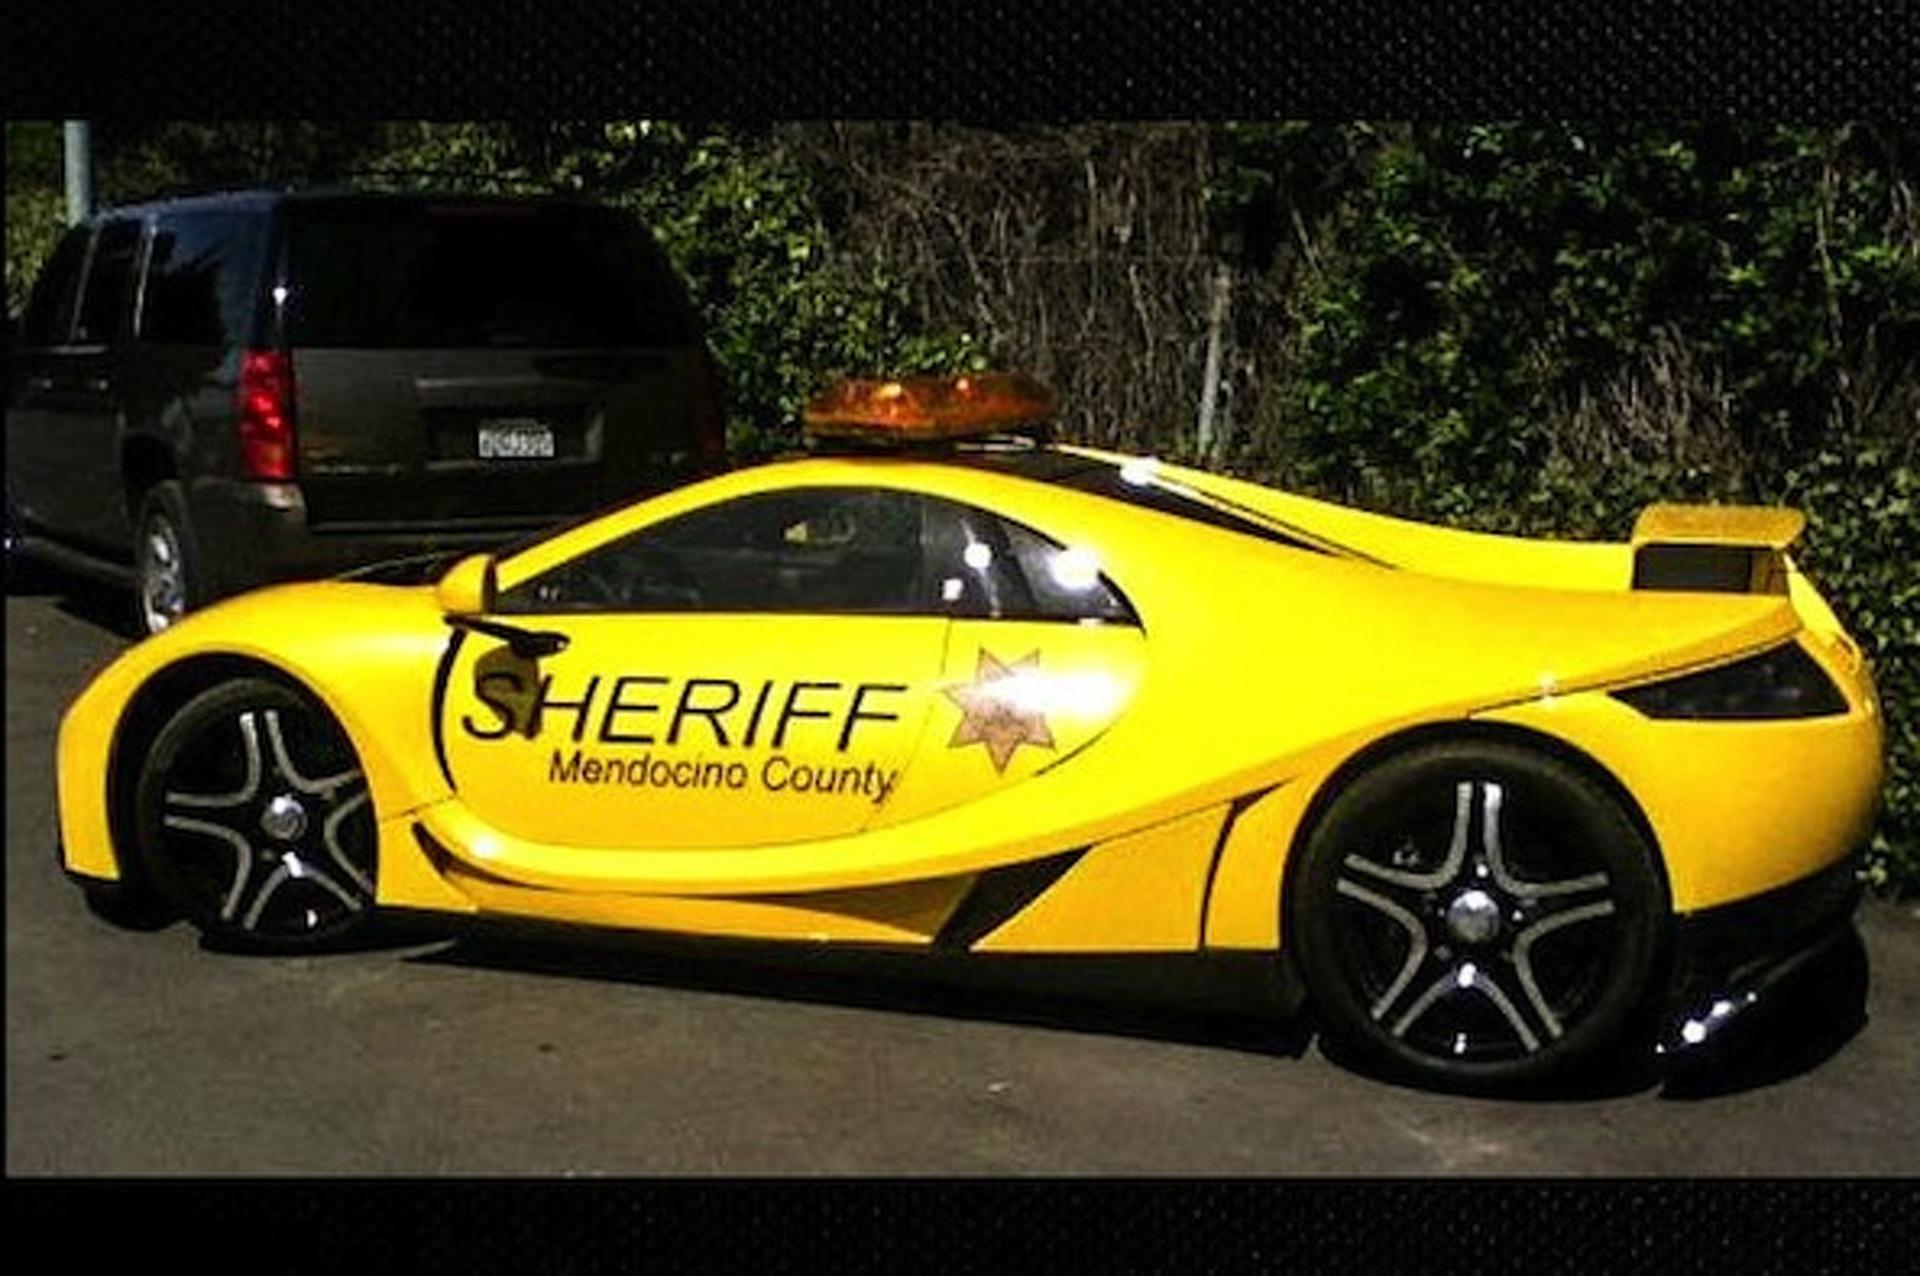 McLaren P1, Koenigsegg Agera, GTA Spano (?) on Need for Speed Set [UPDATE] Yup, GTA Spano